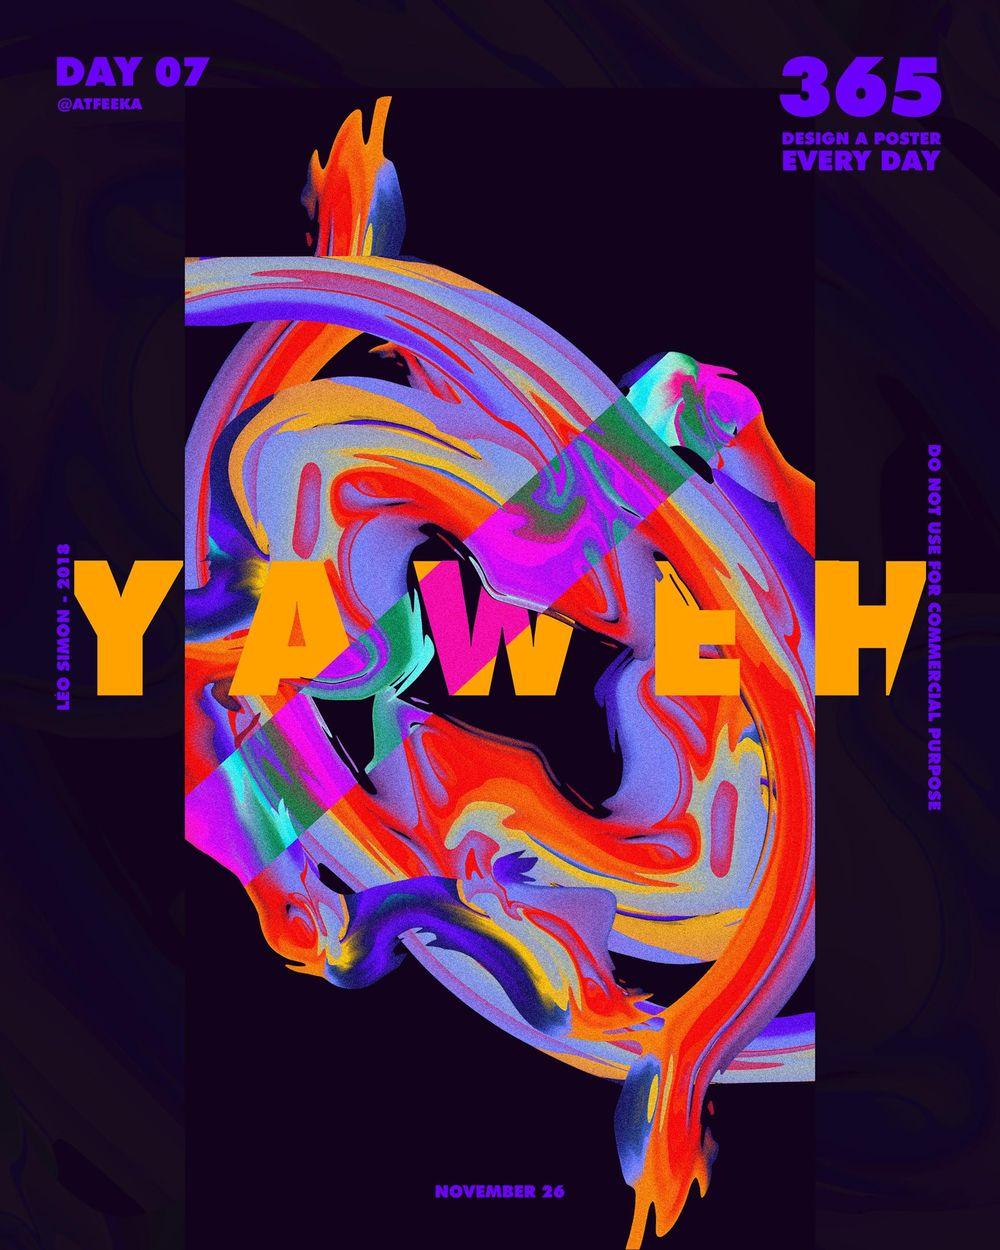 YAWEH - image 1 - student project